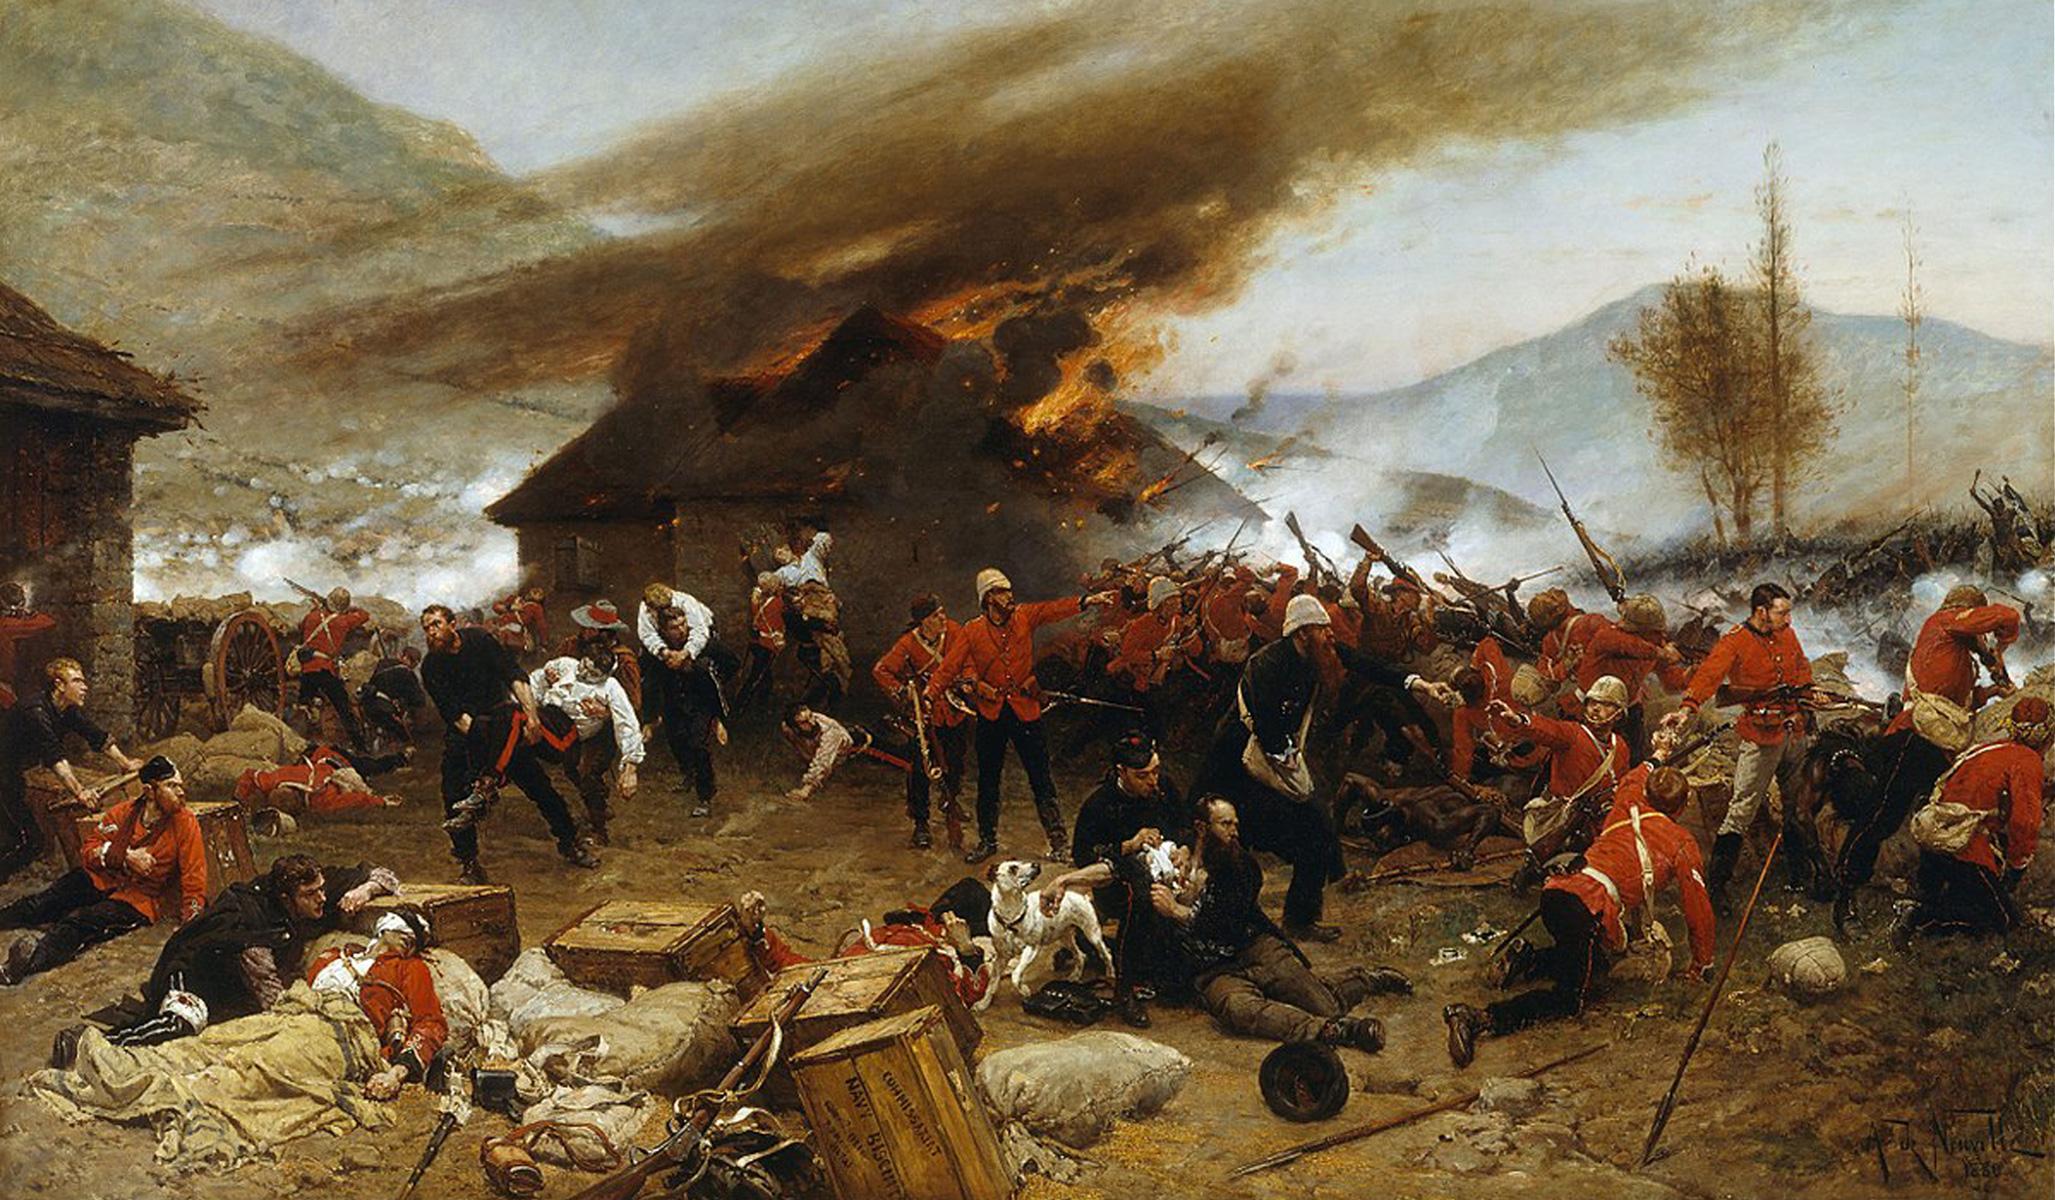 The Defence of Rorke's Drift, by Alphonse de Neuville